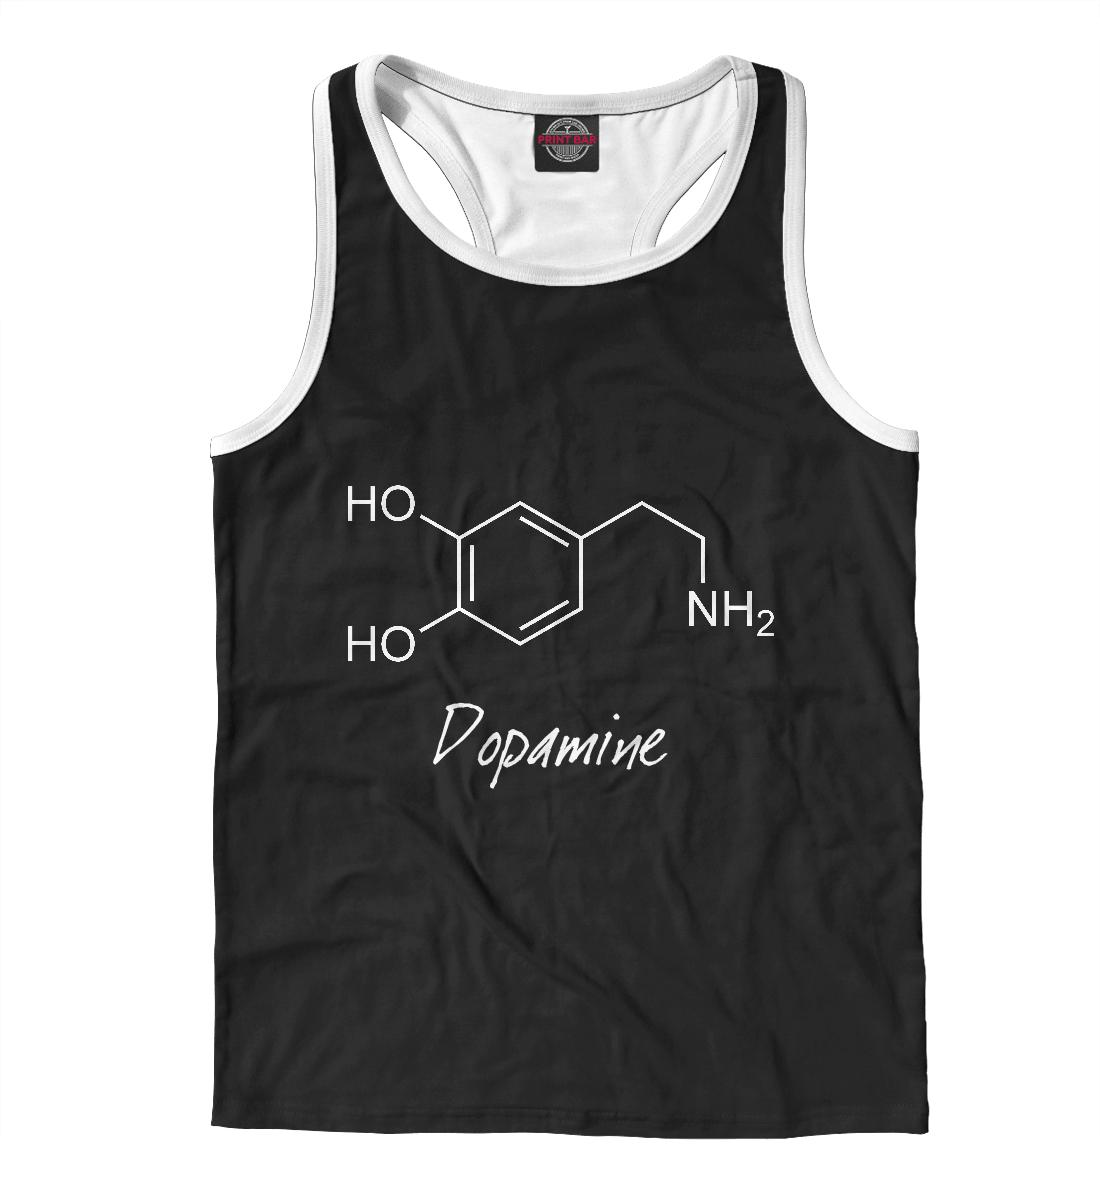 Купить Химия Дофамин, Printbar, Майки борцовки, CHM-824886-mayb-2